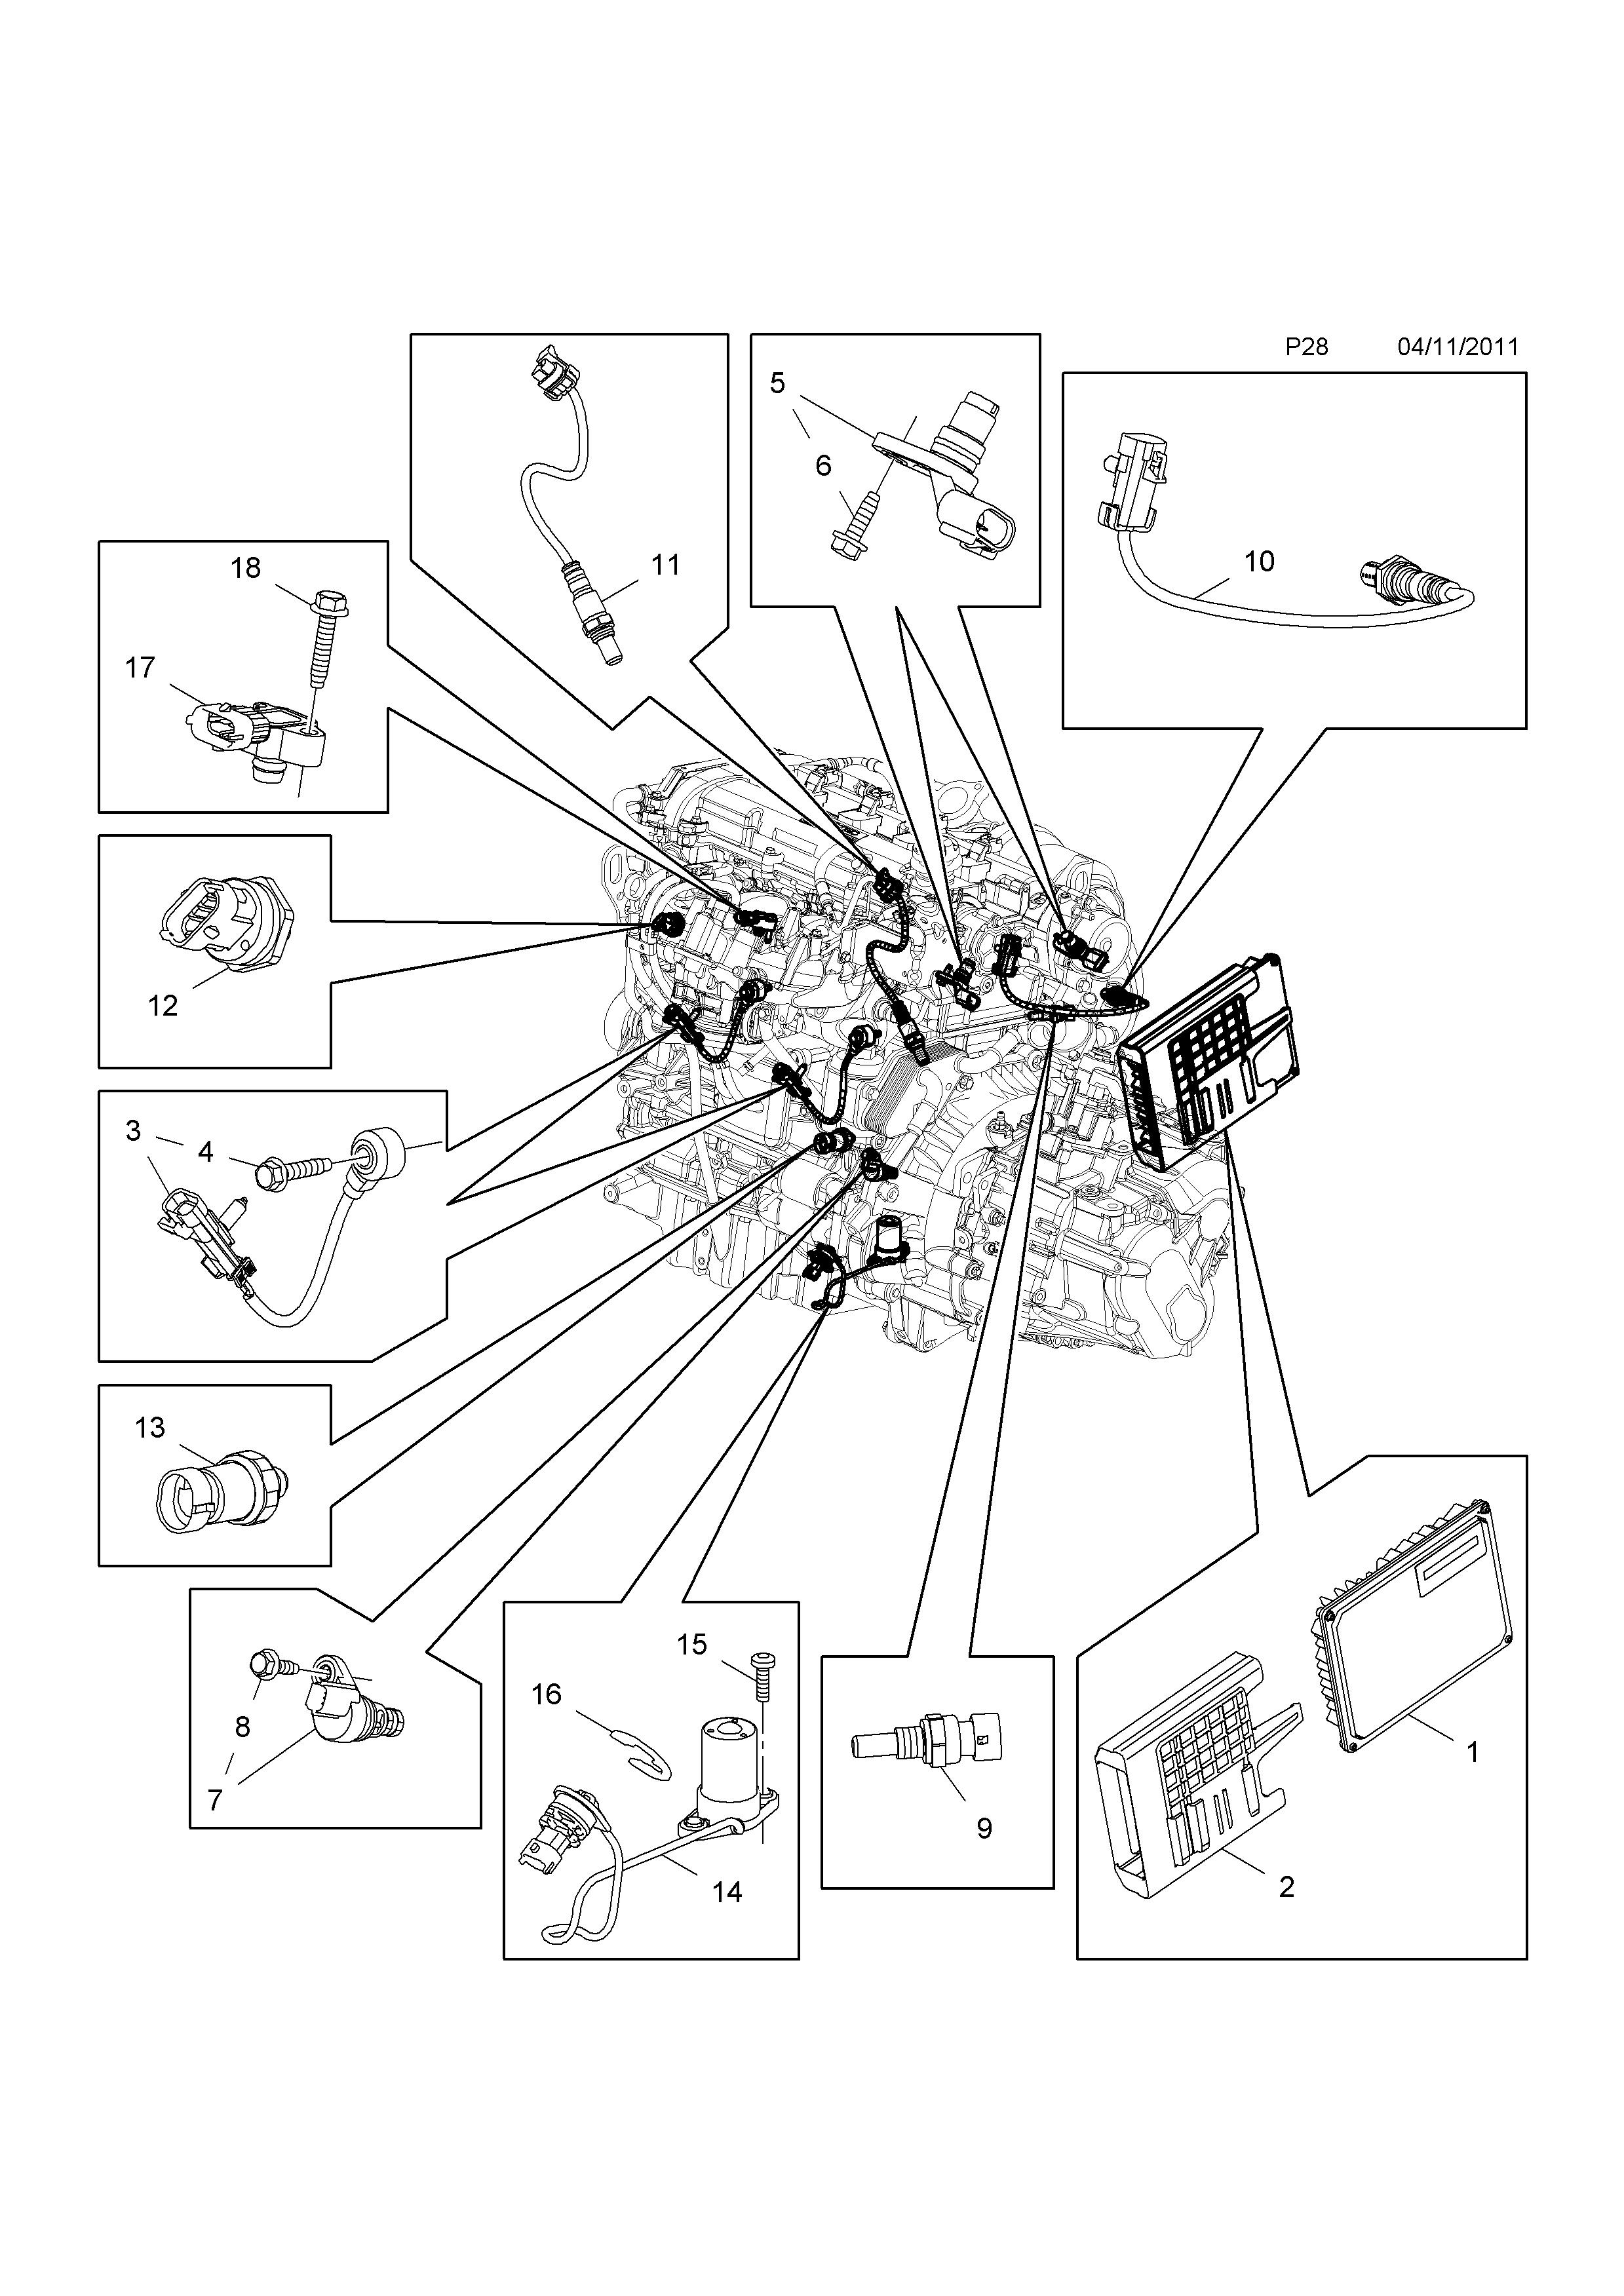 vauxhall fuel pressure diagram wiring library rh 42 budoshop4you de Car Fuel Diagram How a Car Works Diagram